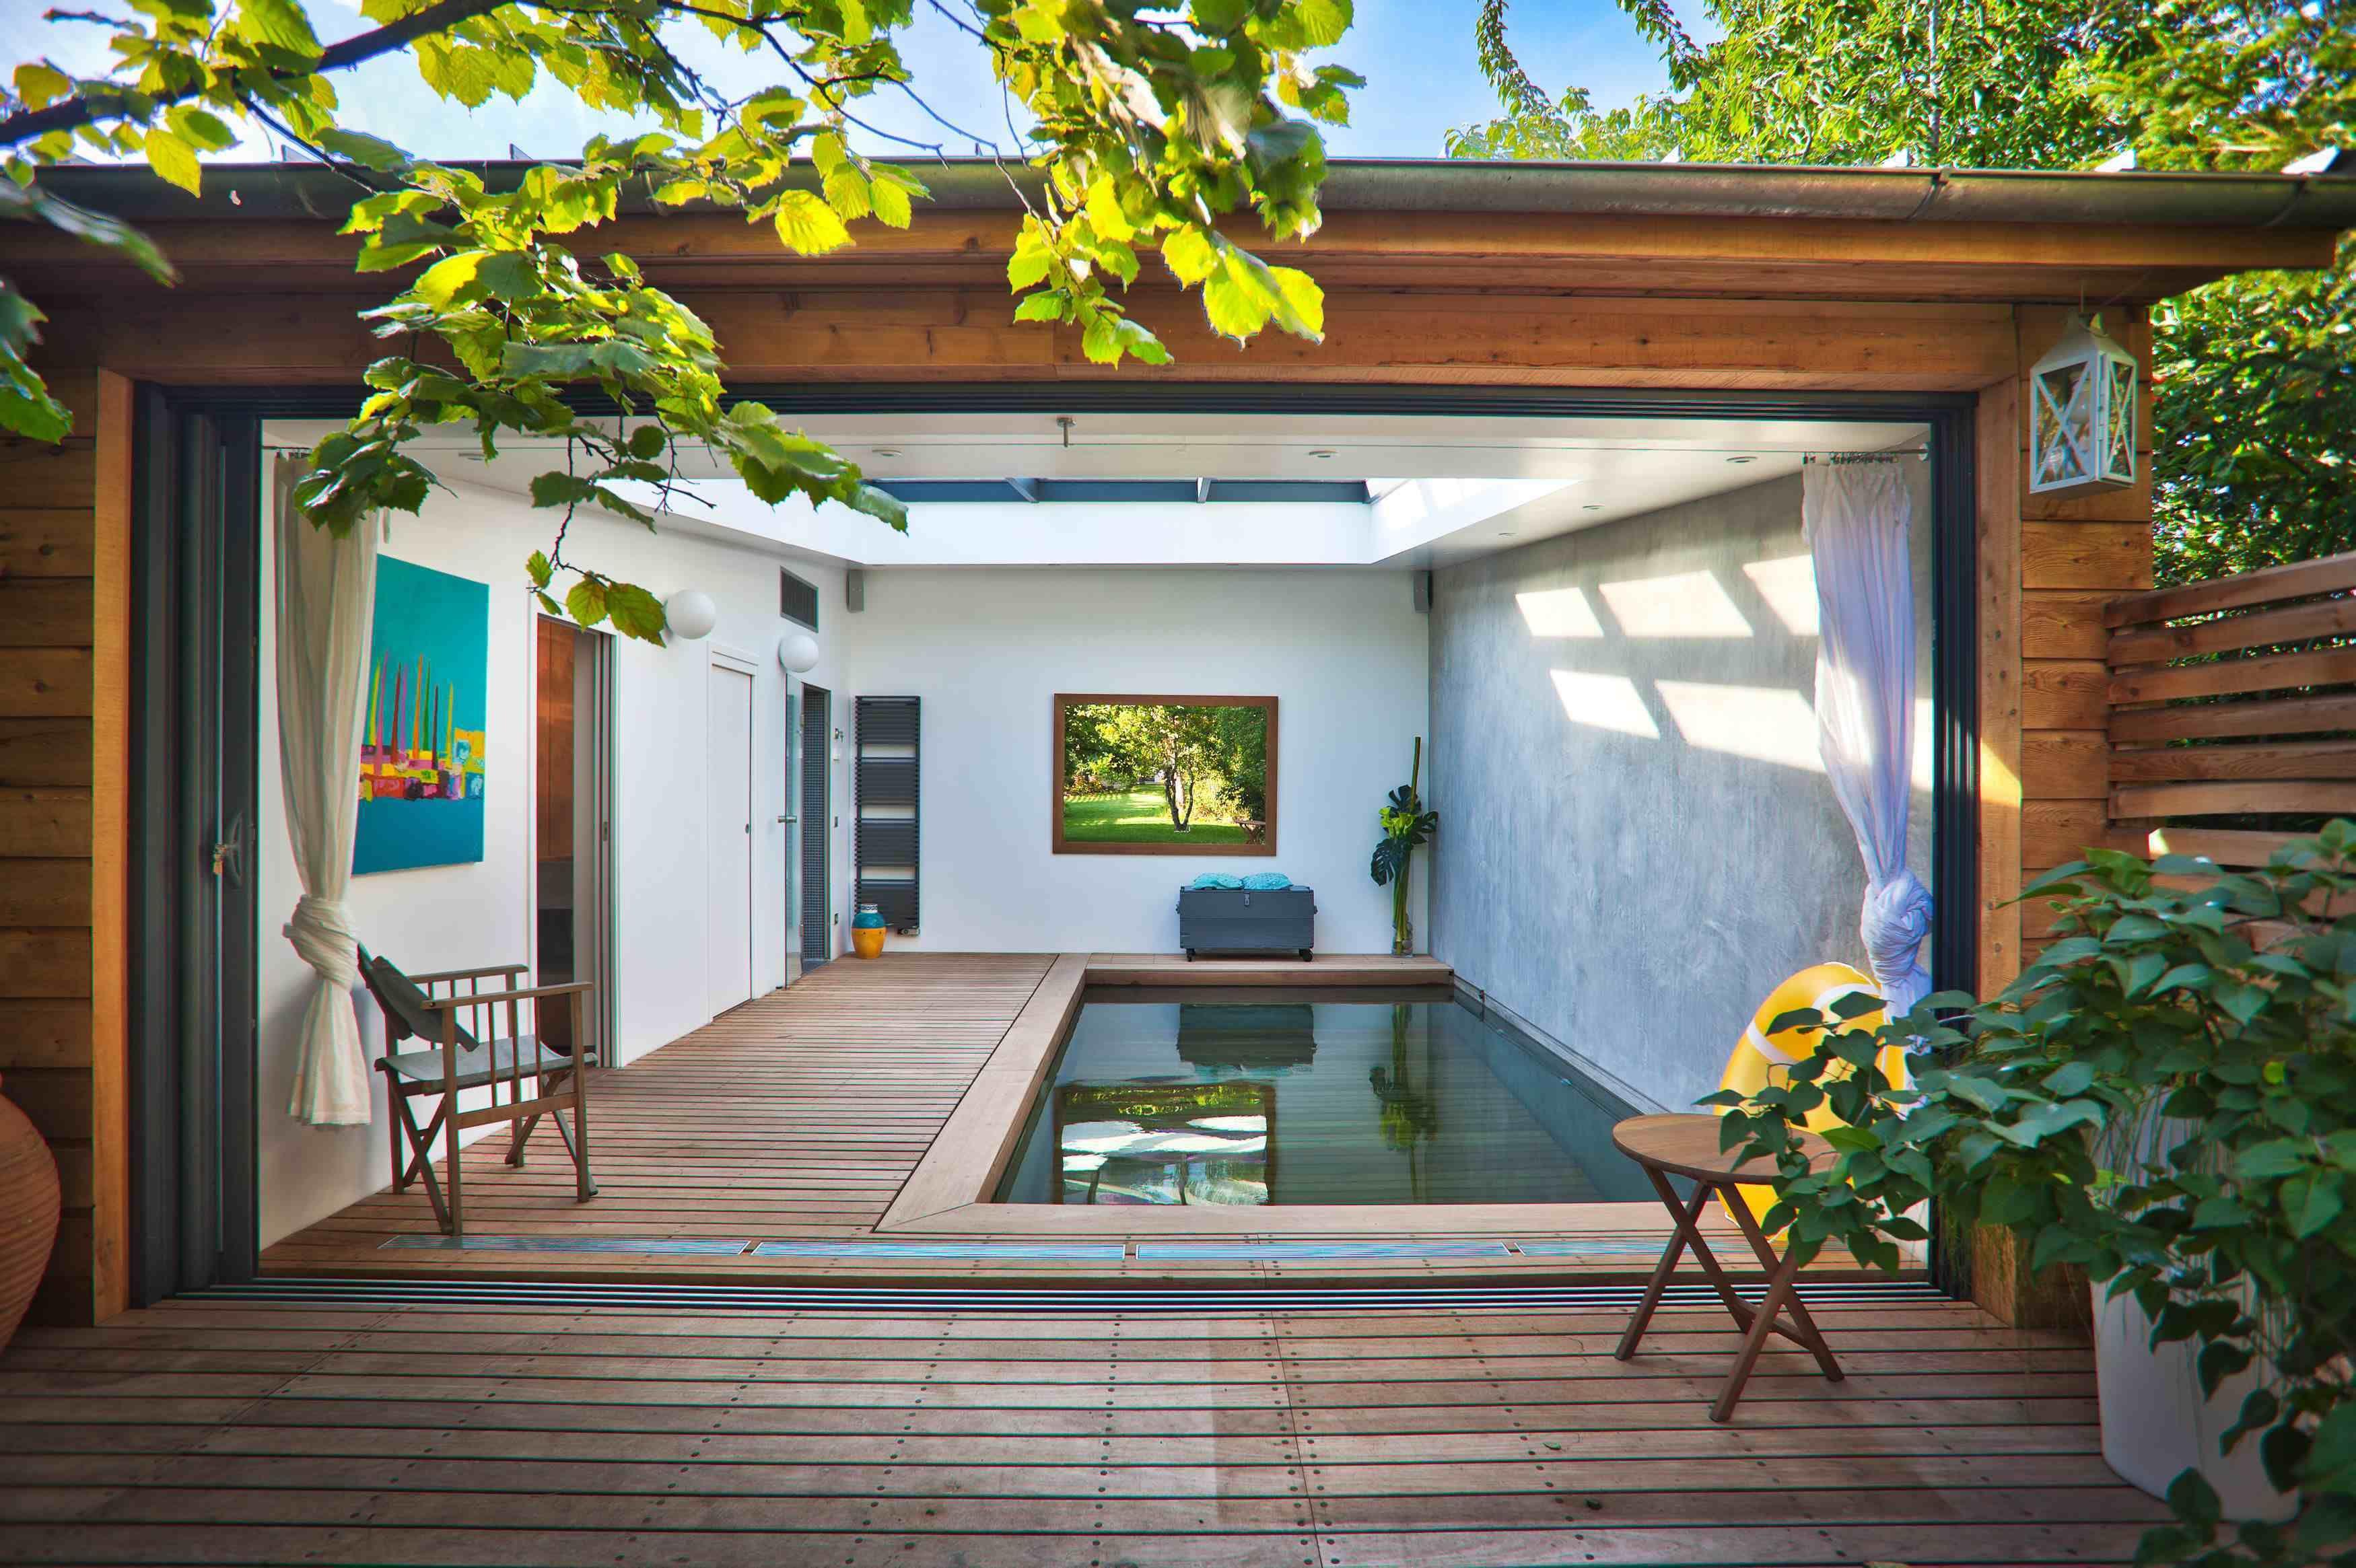 abri de jardin en bois red cedar piscine couverte donne envie de s installer en banlieue. Black Bedroom Furniture Sets. Home Design Ideas